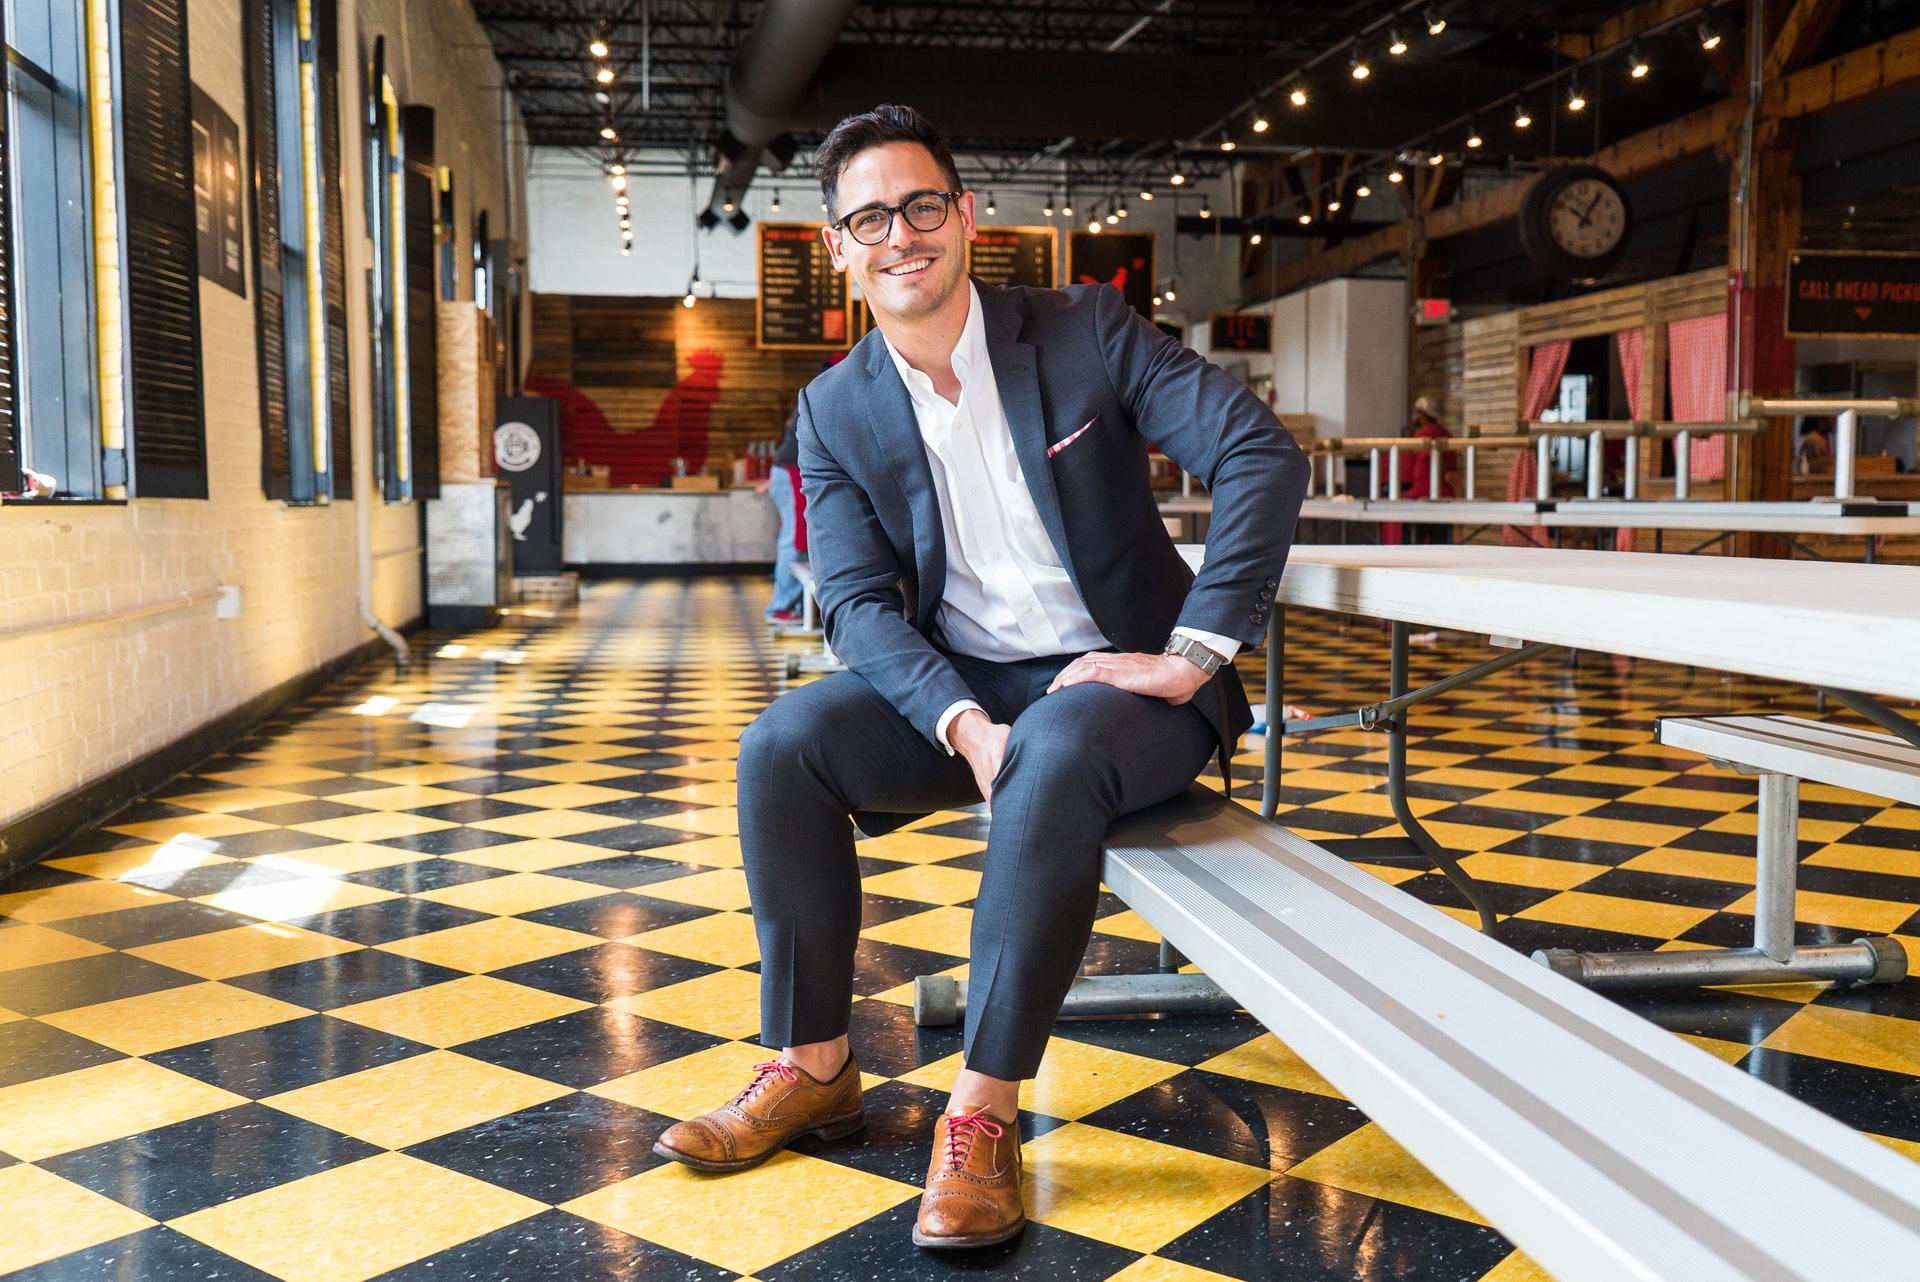 Founder Stories: Joe Deloss